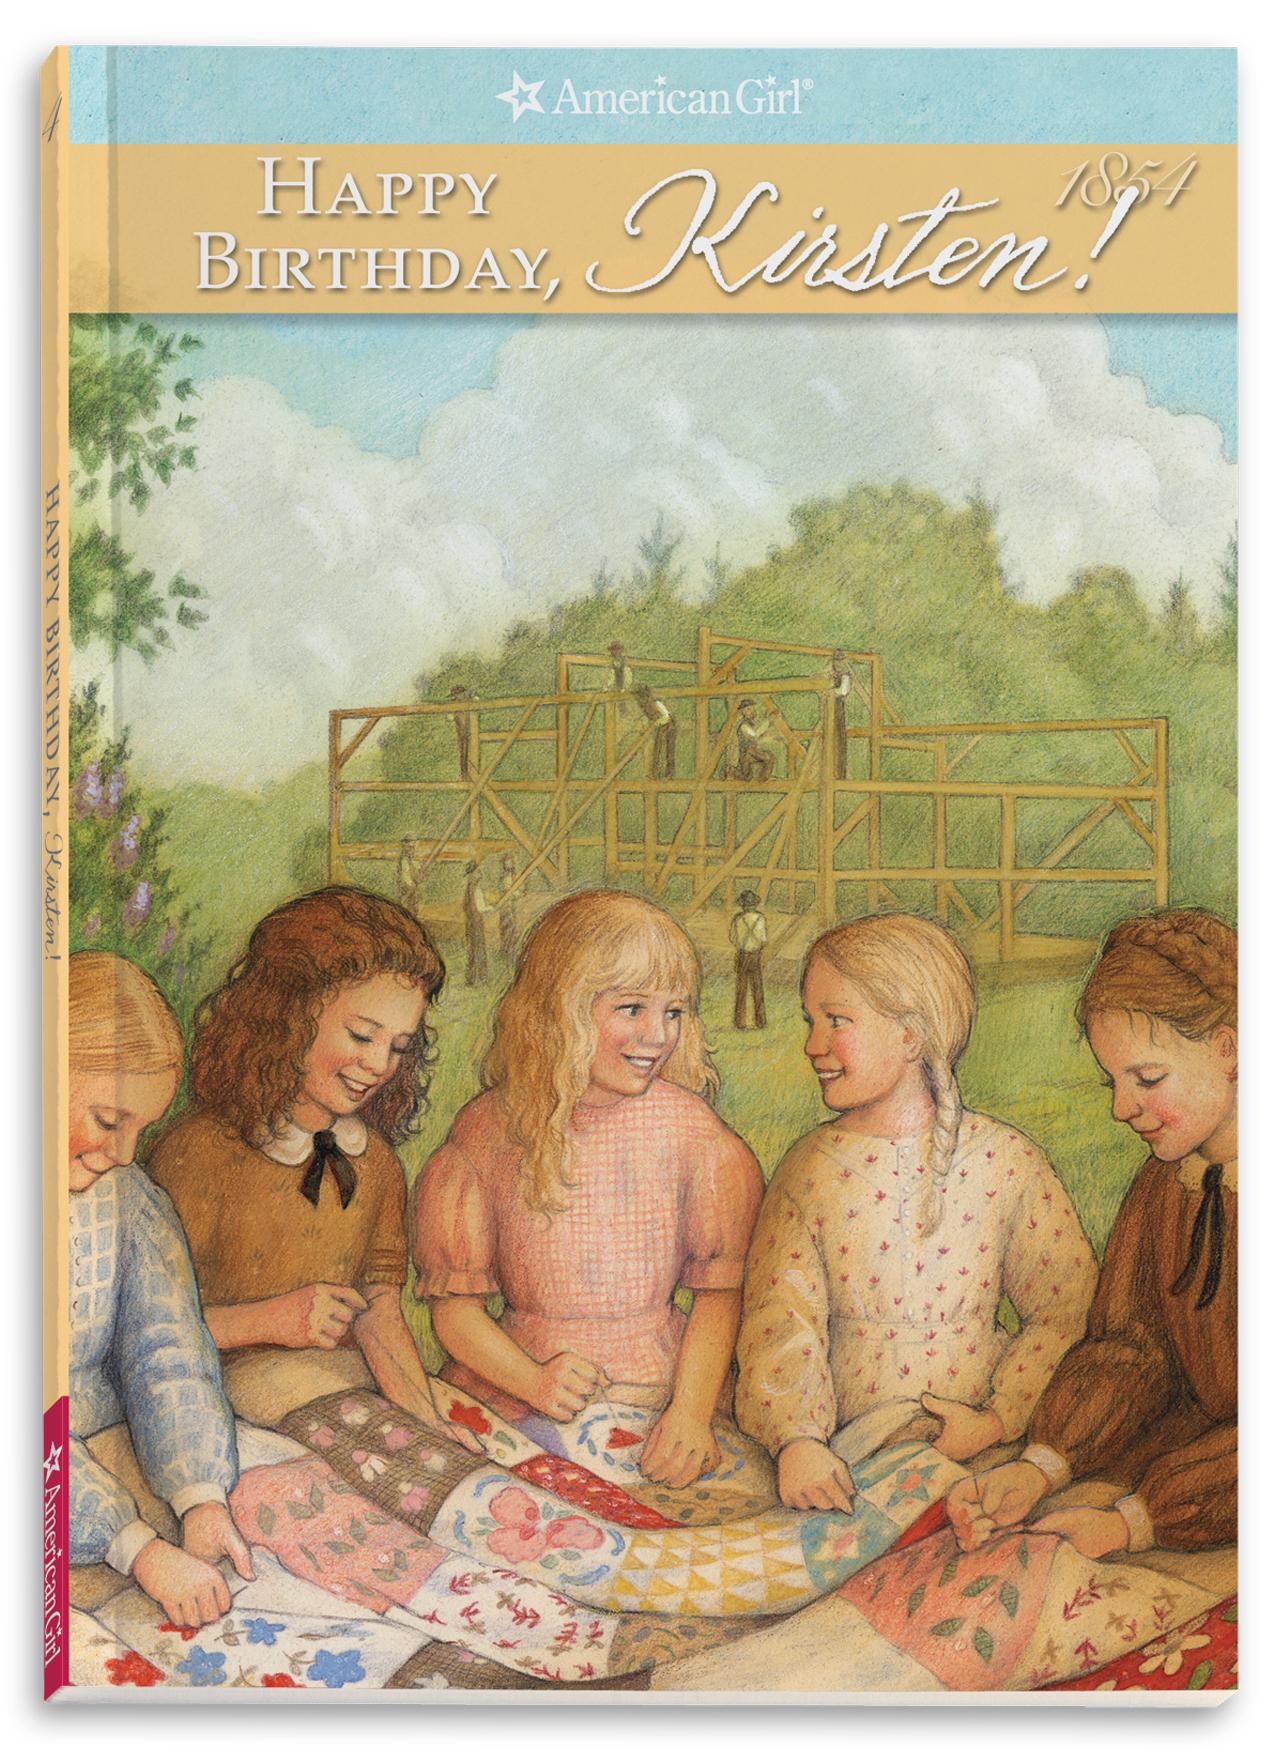 Happy Birthday, Kirsten!